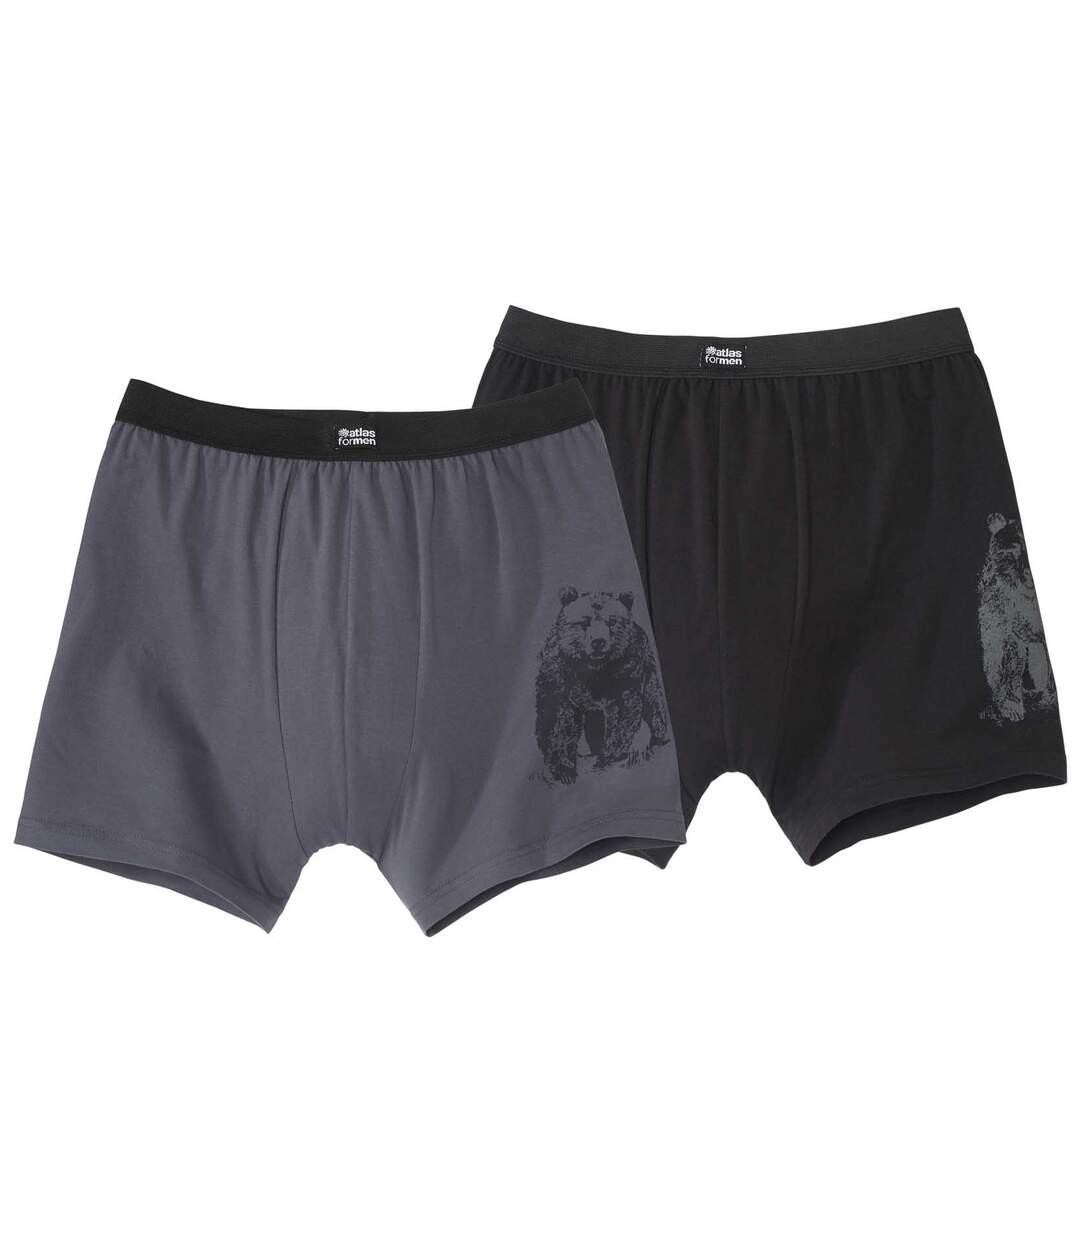 Set van 2 supercomfortabele boxershorts